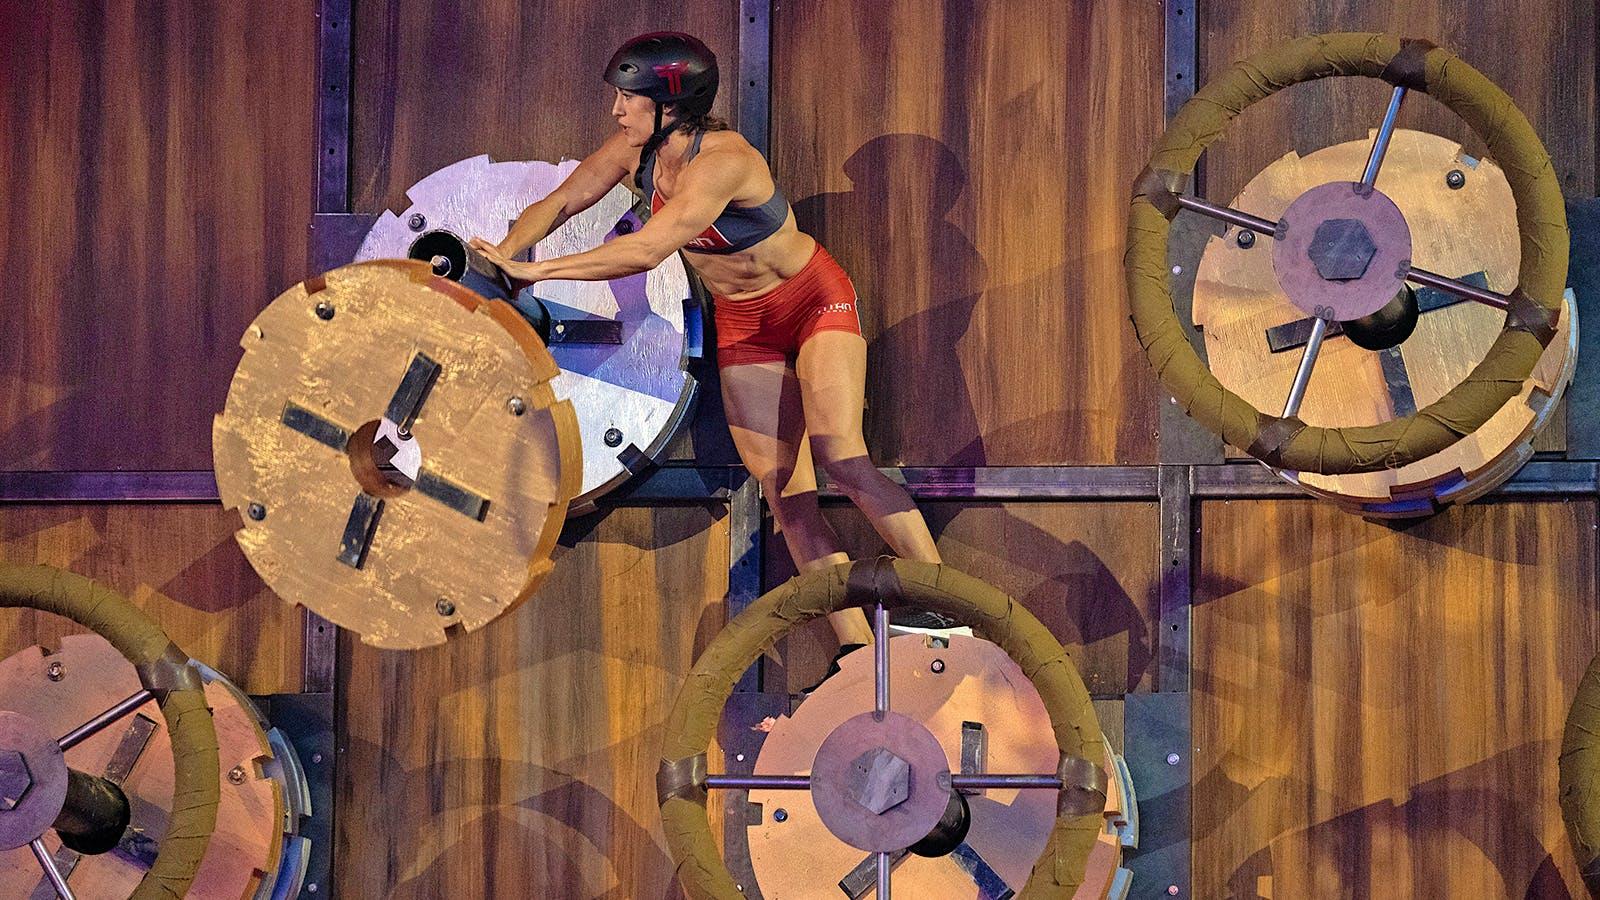 Winemaker Margaux Alvarez also Crushes Opponents on 'Titan Games' Show